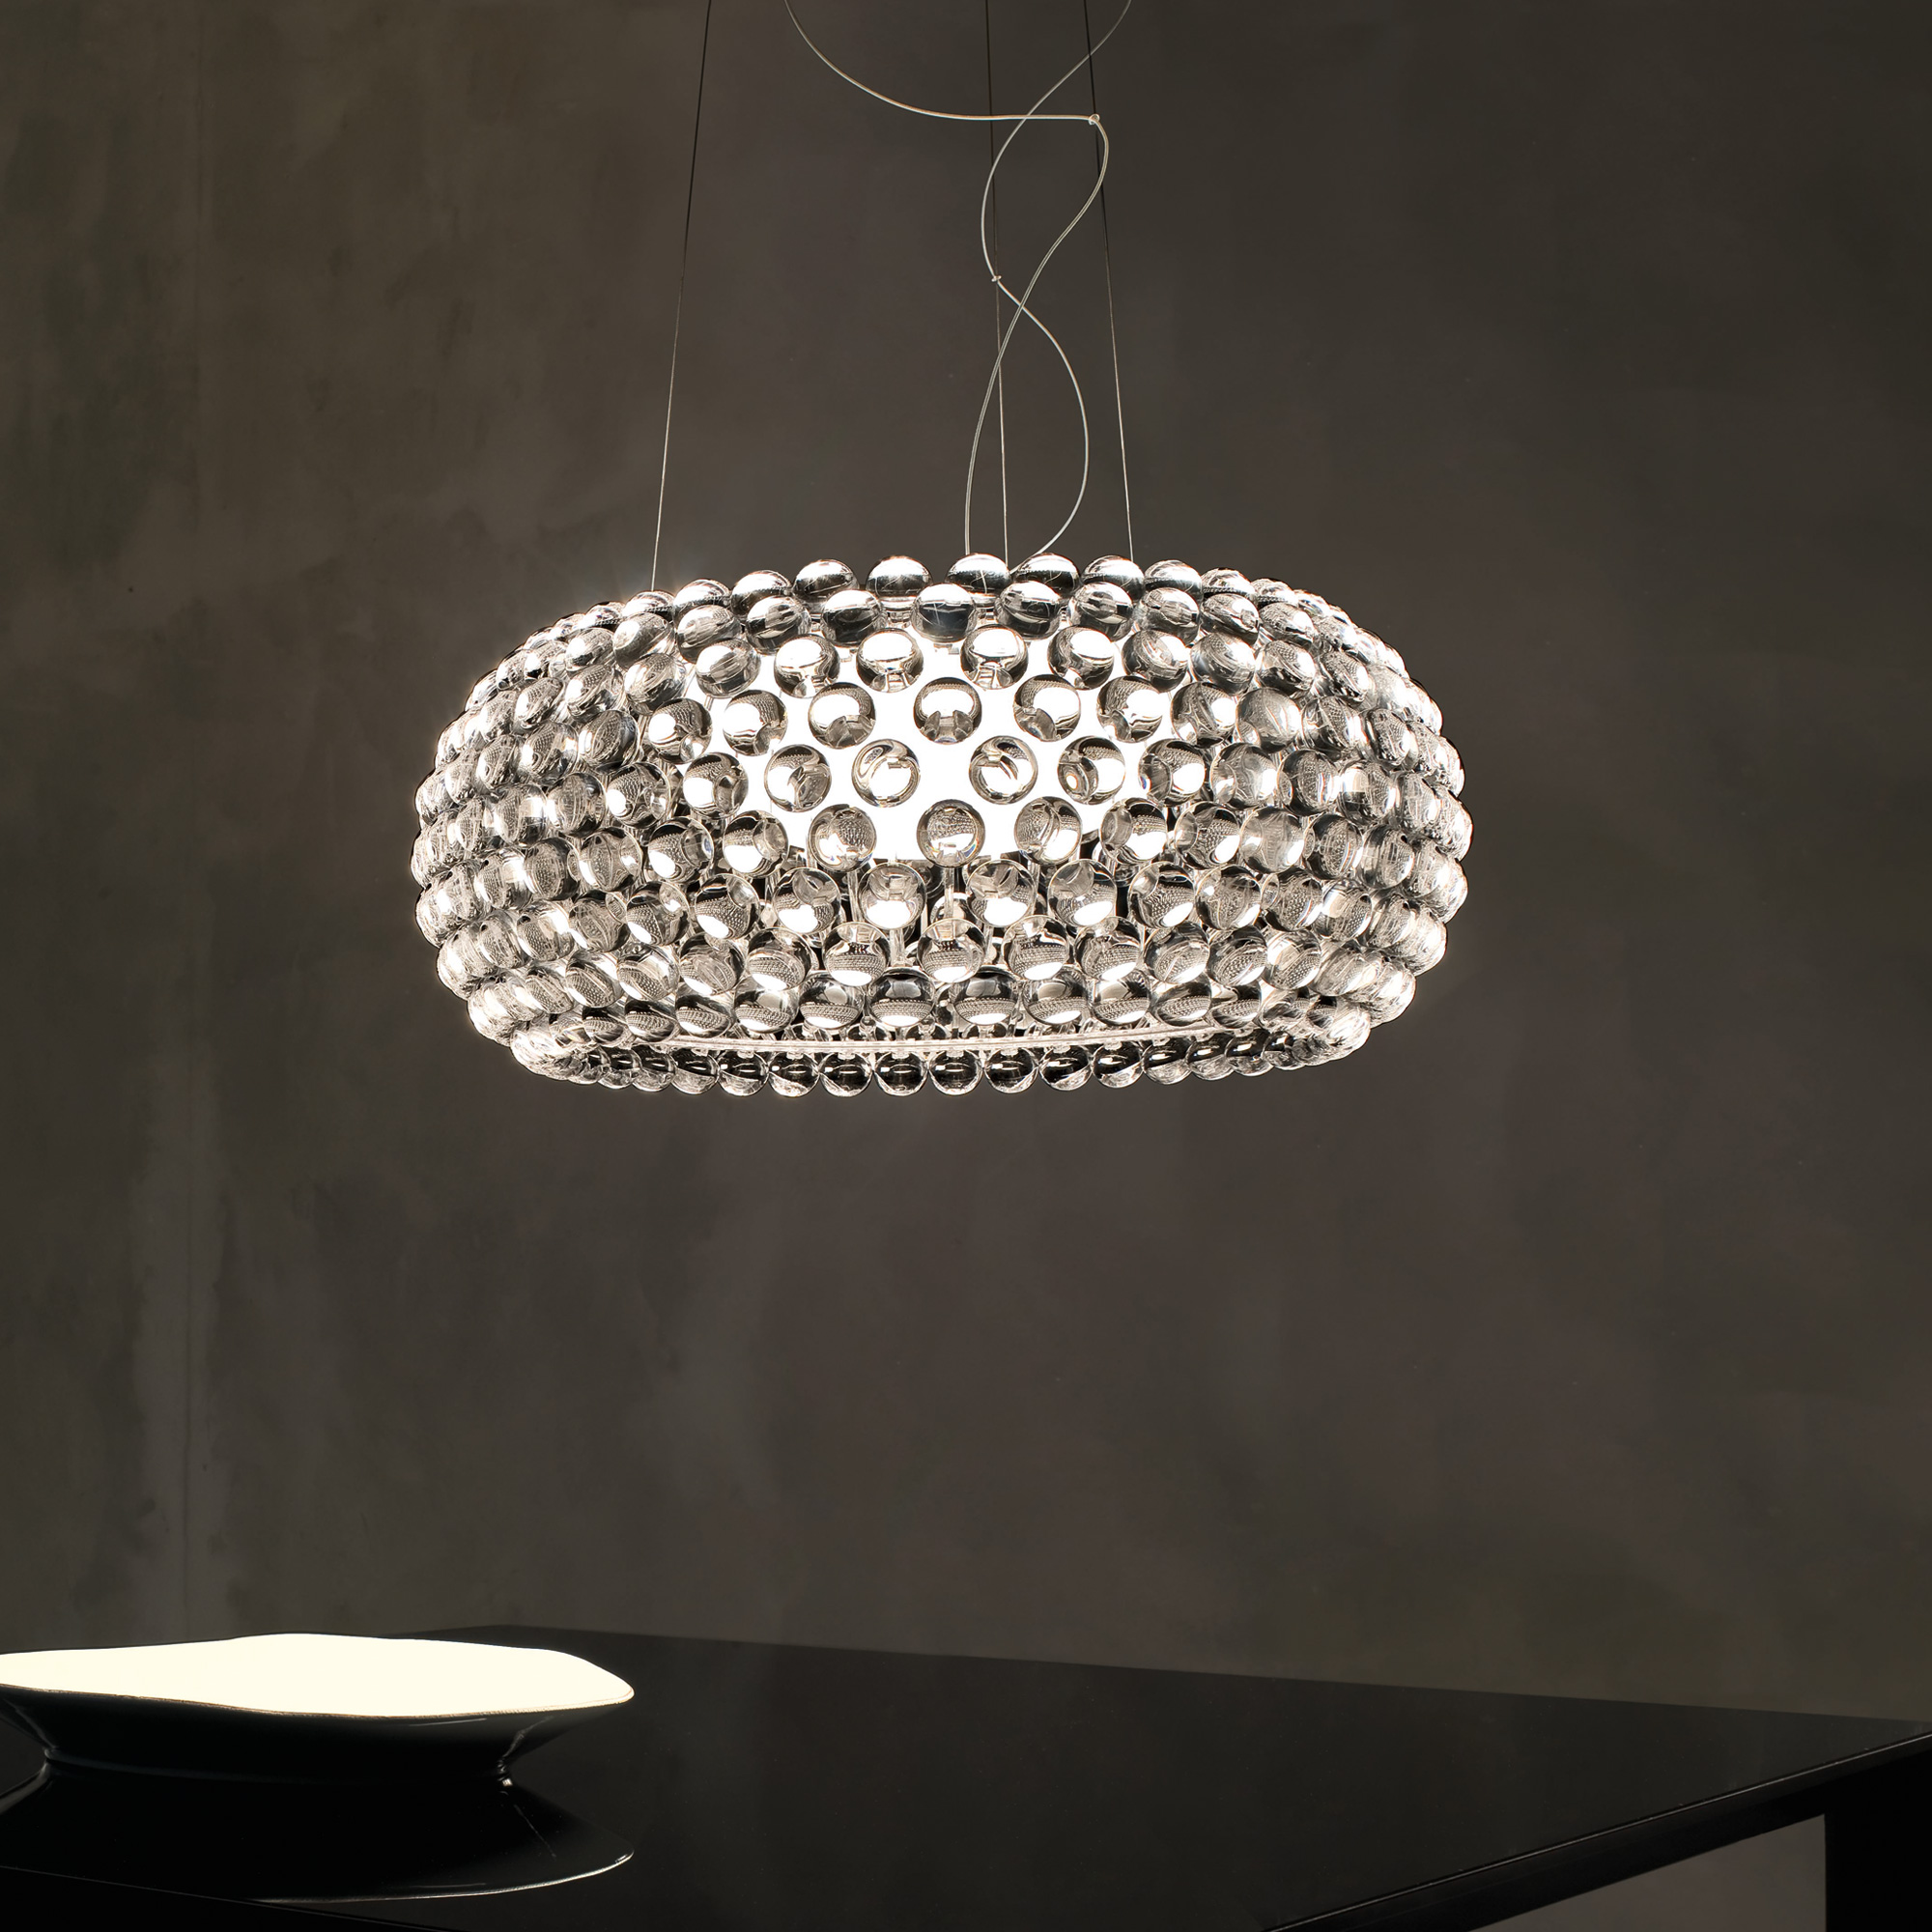 foscarini caboche grande sospensione pendelleuchte 13801716 reuter onlineshop. Black Bedroom Furniture Sets. Home Design Ideas